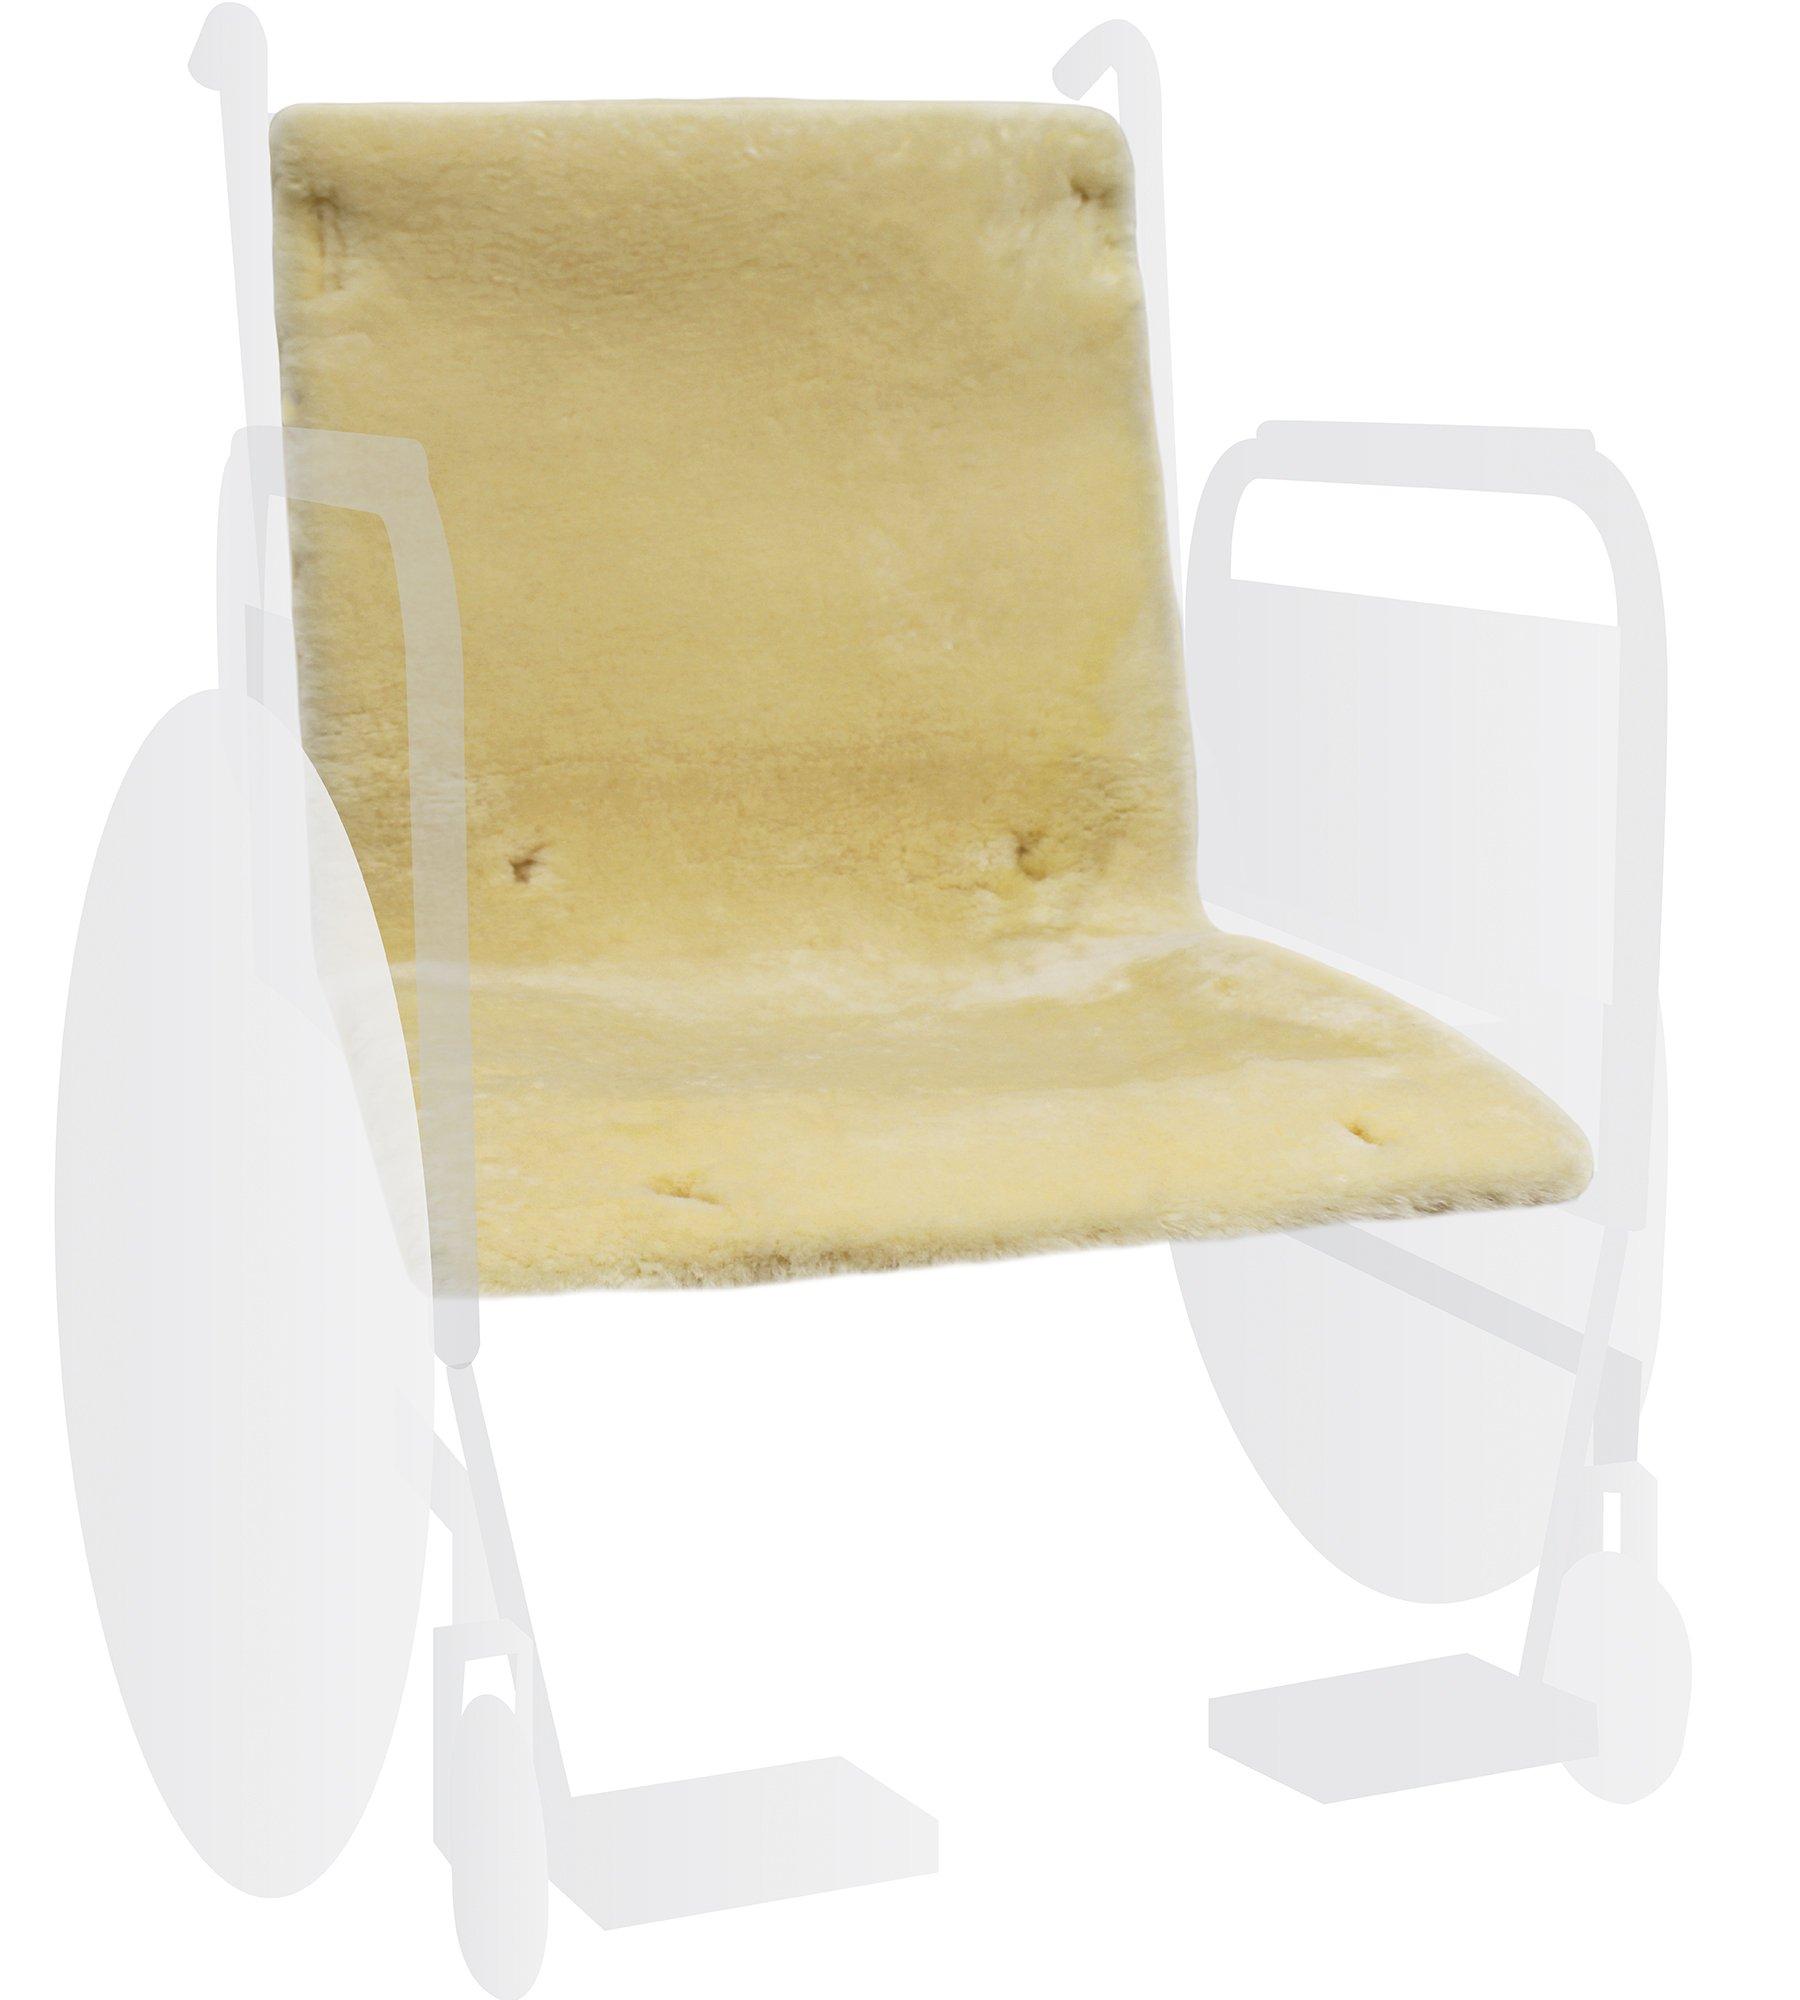 Eurow® Sheepskin Wheelchair Full Seat Cover - Champagne